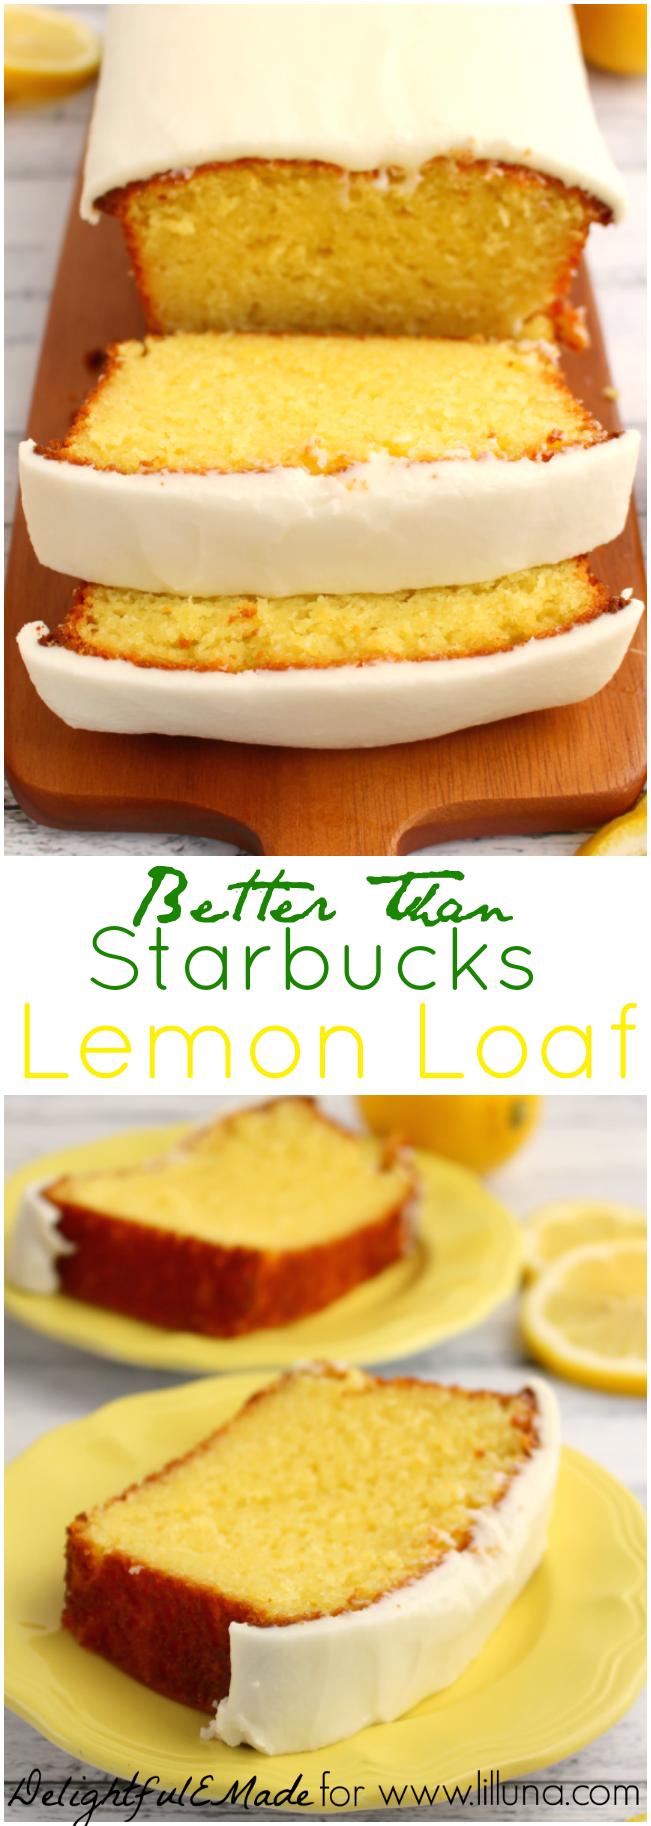 how to make big muffins like starbucks